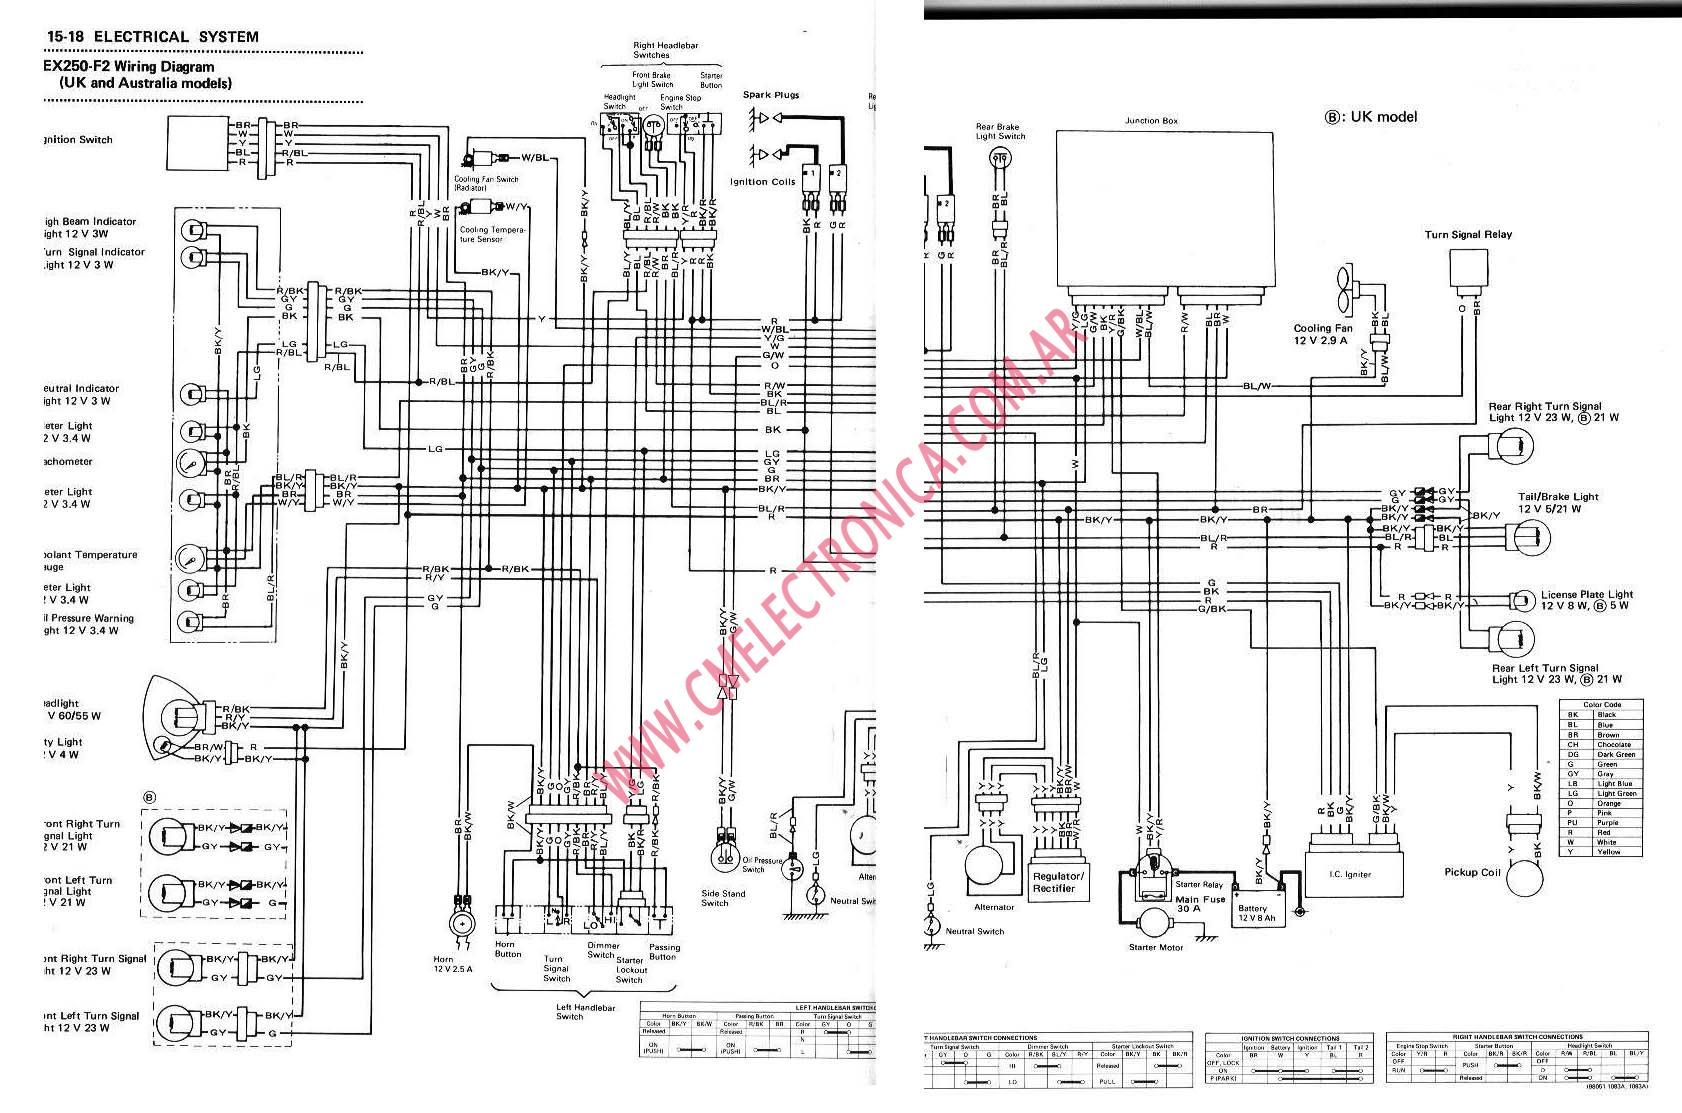 Jaguar Xj8 Fuse Box Diagram Jaguar Auto Wiring Diagram